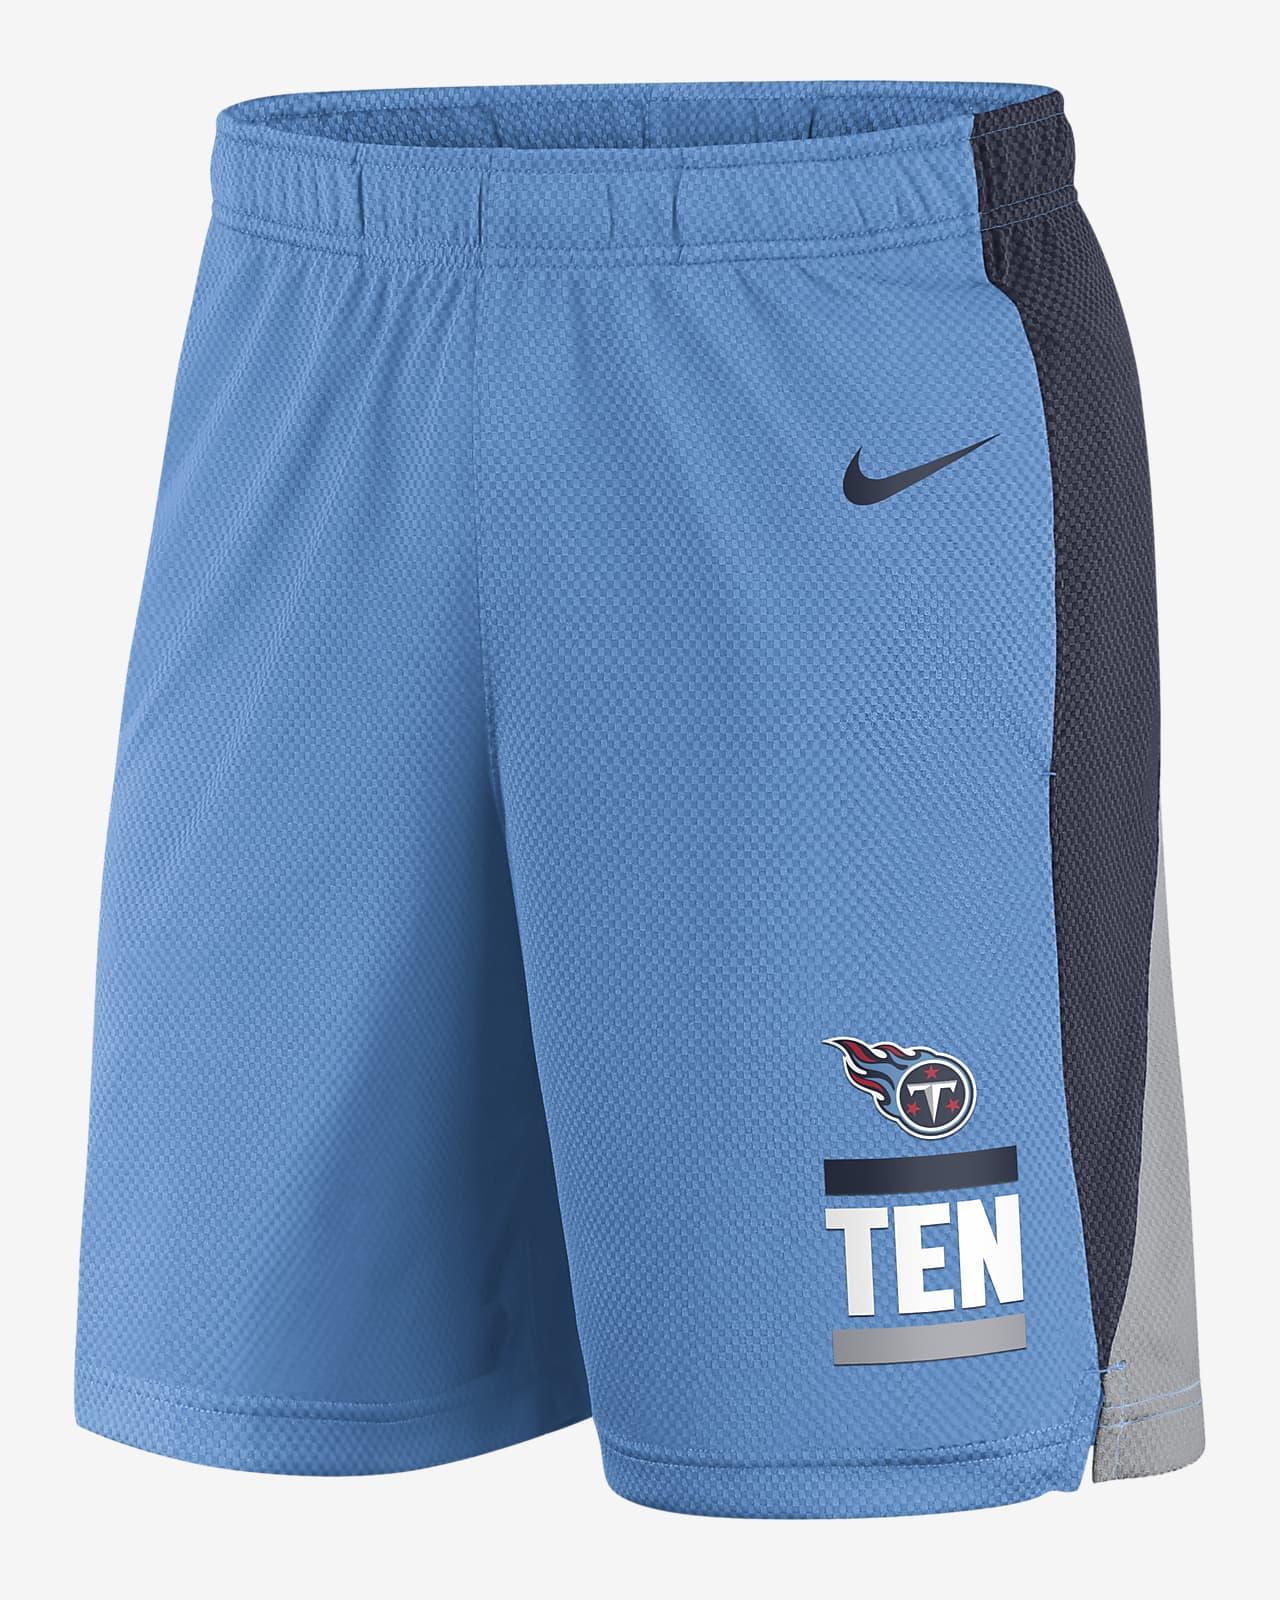 Nike Dri-FIT Broadcast (NFL Tennessee Titans) Men's Shorts